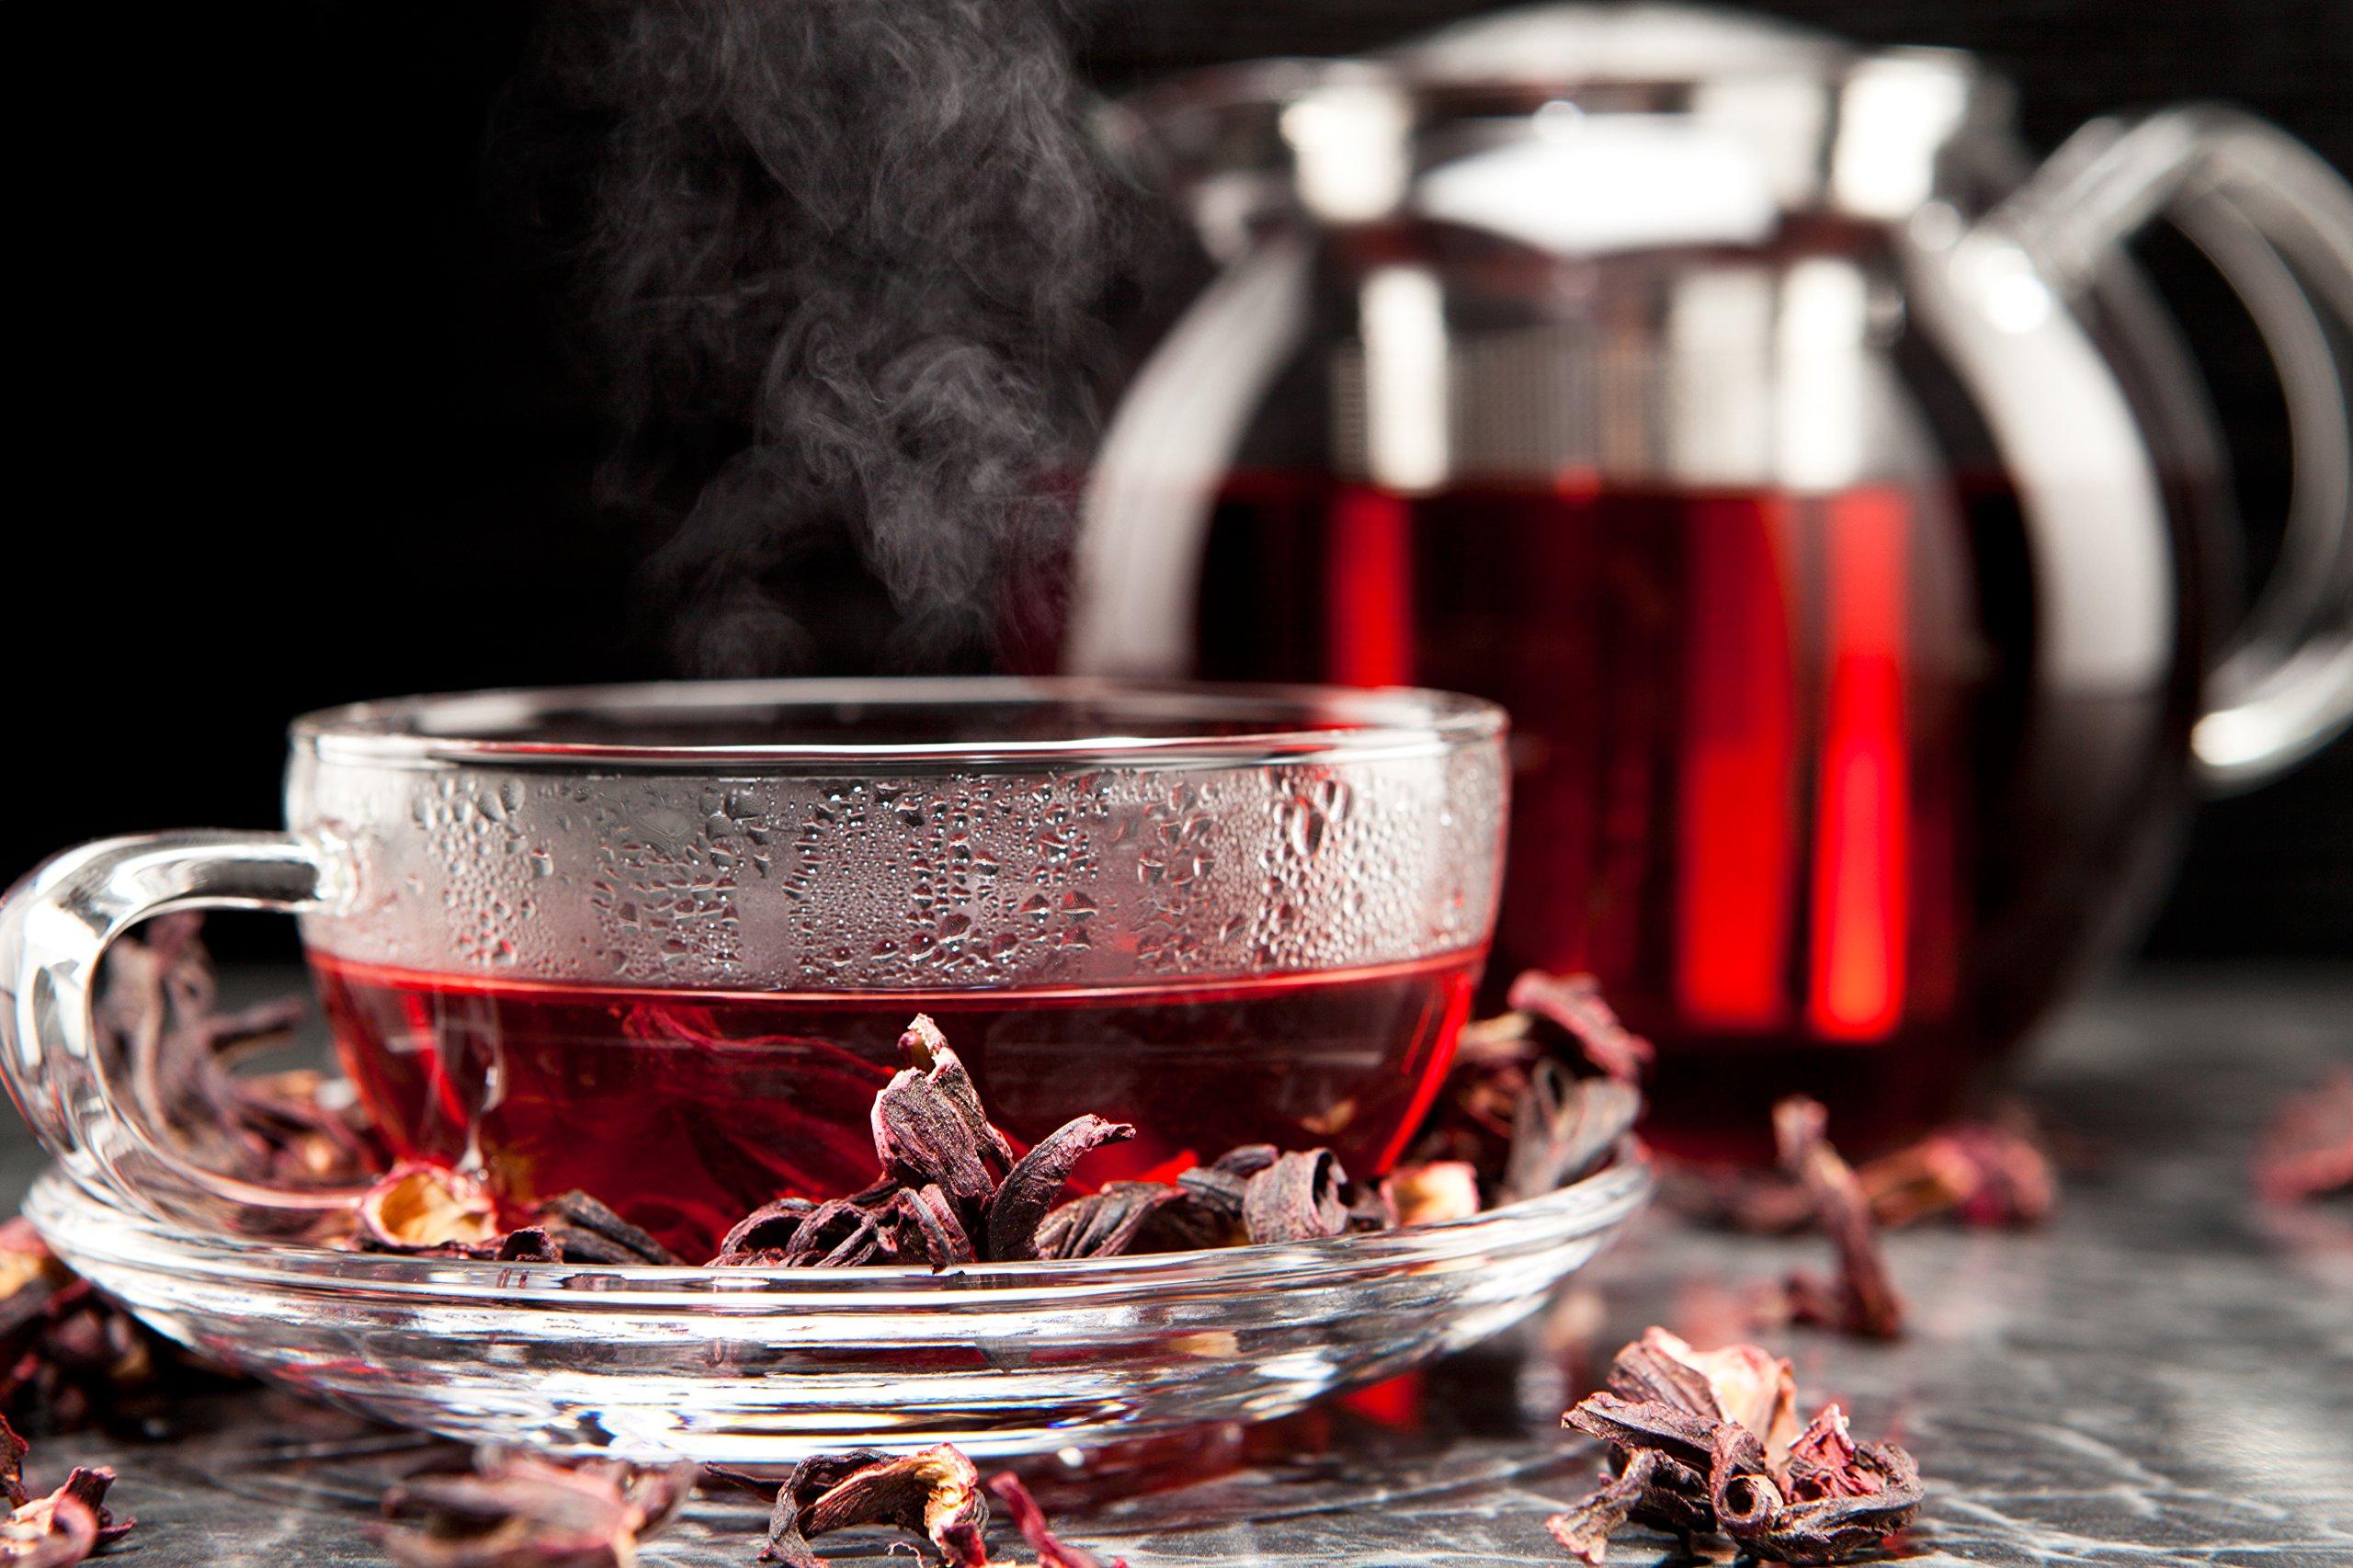 Hibiscus Tea 1LB (16Oz) 100% CERTIFIED Organic Hibiscus Flowers Herbal Tea (WHOLE PETALS), Caffeine Free in 1 lbs. Bulk Resealable Kraft BPA free Bags from U.S. Wellness by U.S. Wellness Naturals (Image #7)